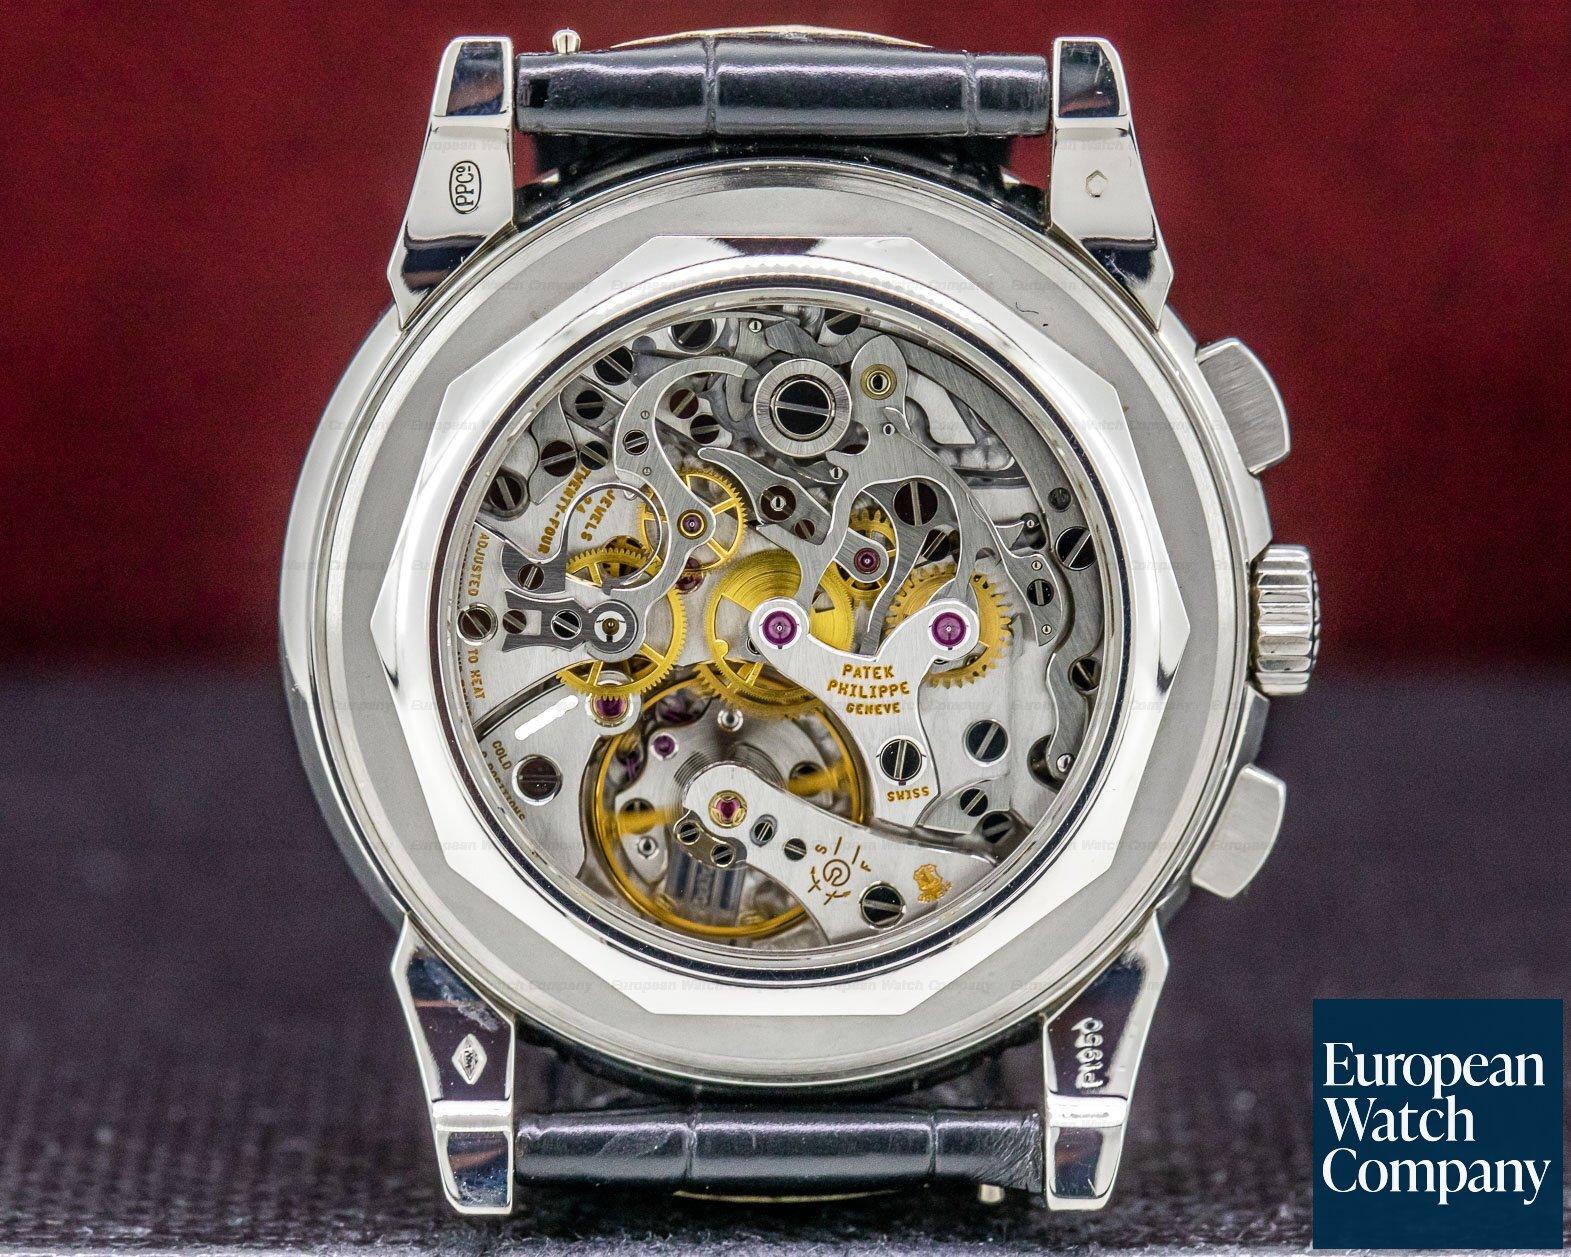 Patek Philippe 5970P-001 Perpetual Calendar Chronograph Platinum FULL SET